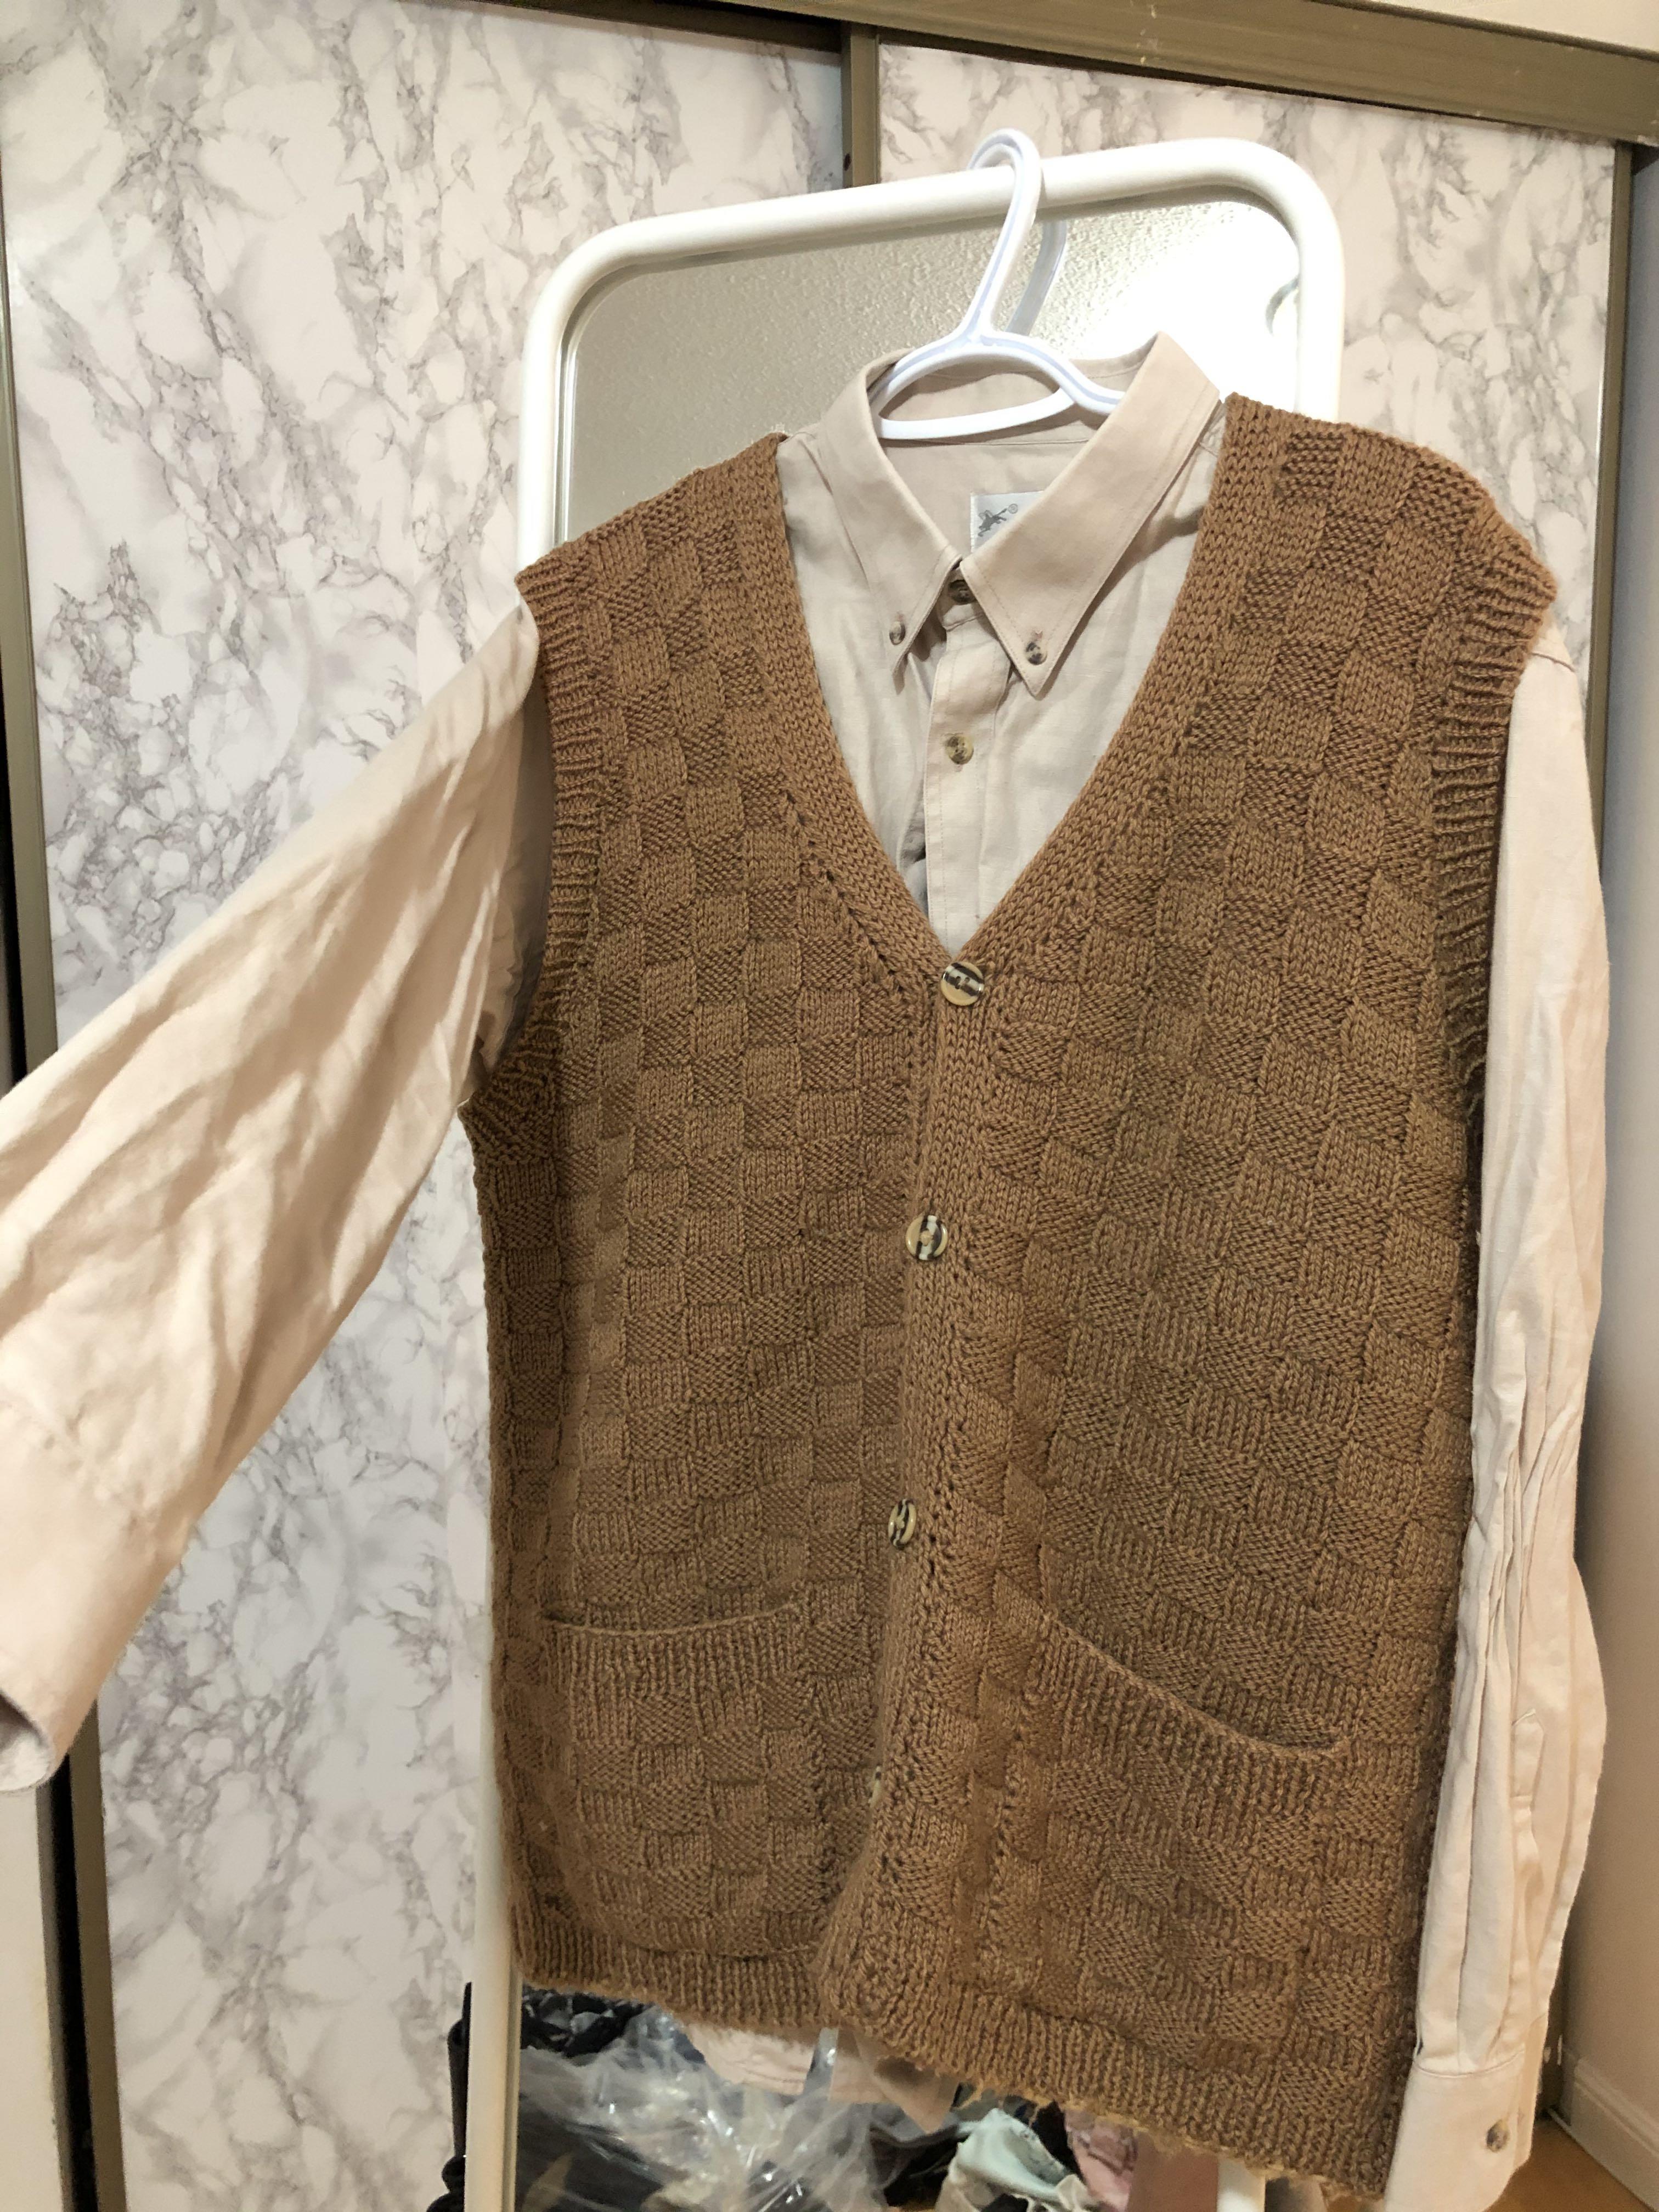 Korean style dress shirt/vest